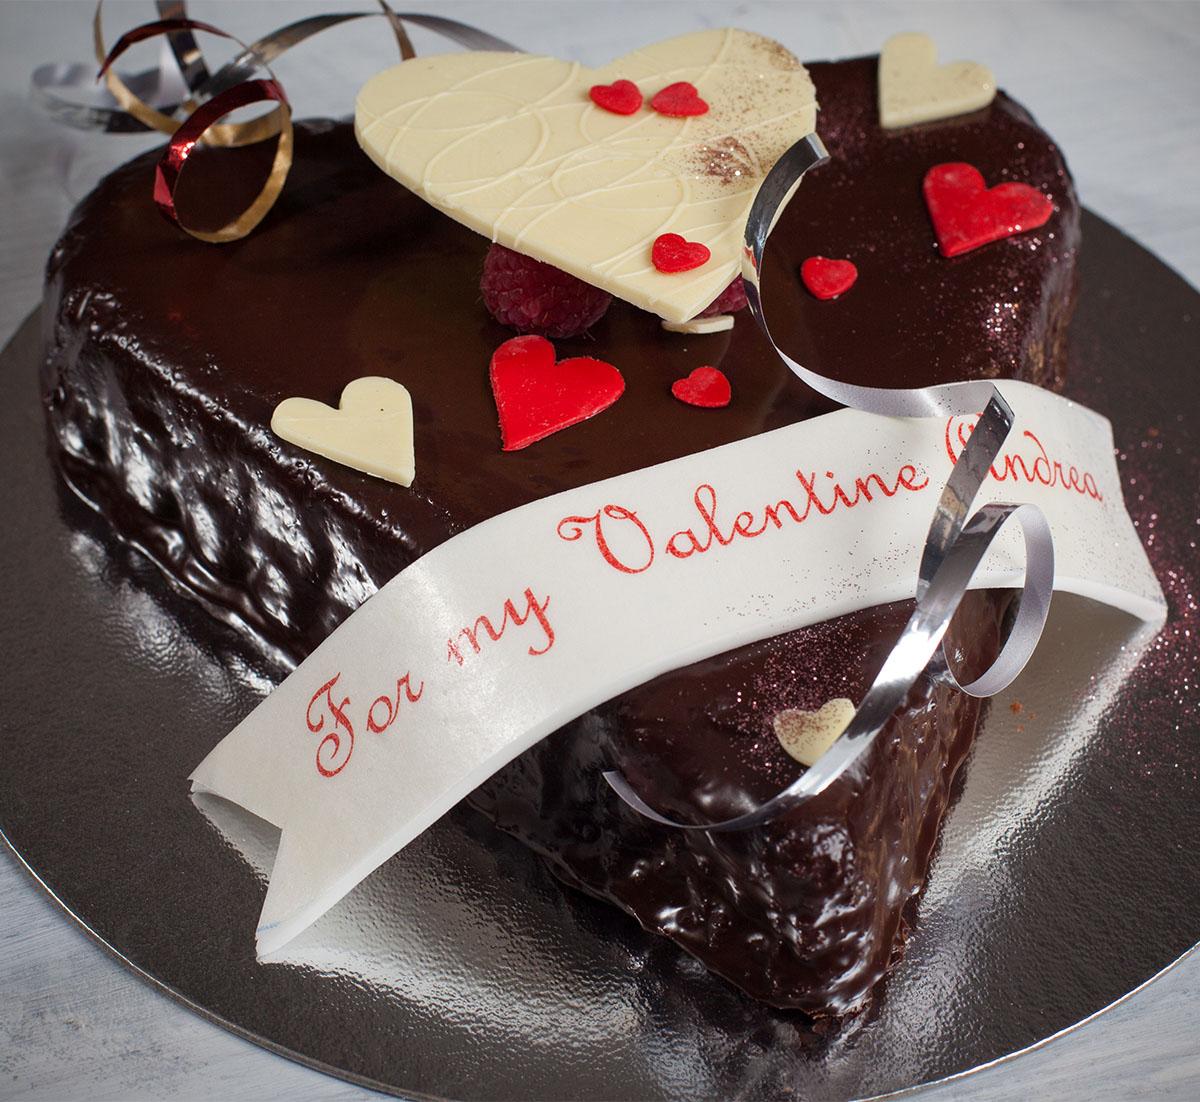 ValentinesDayCake.jpg